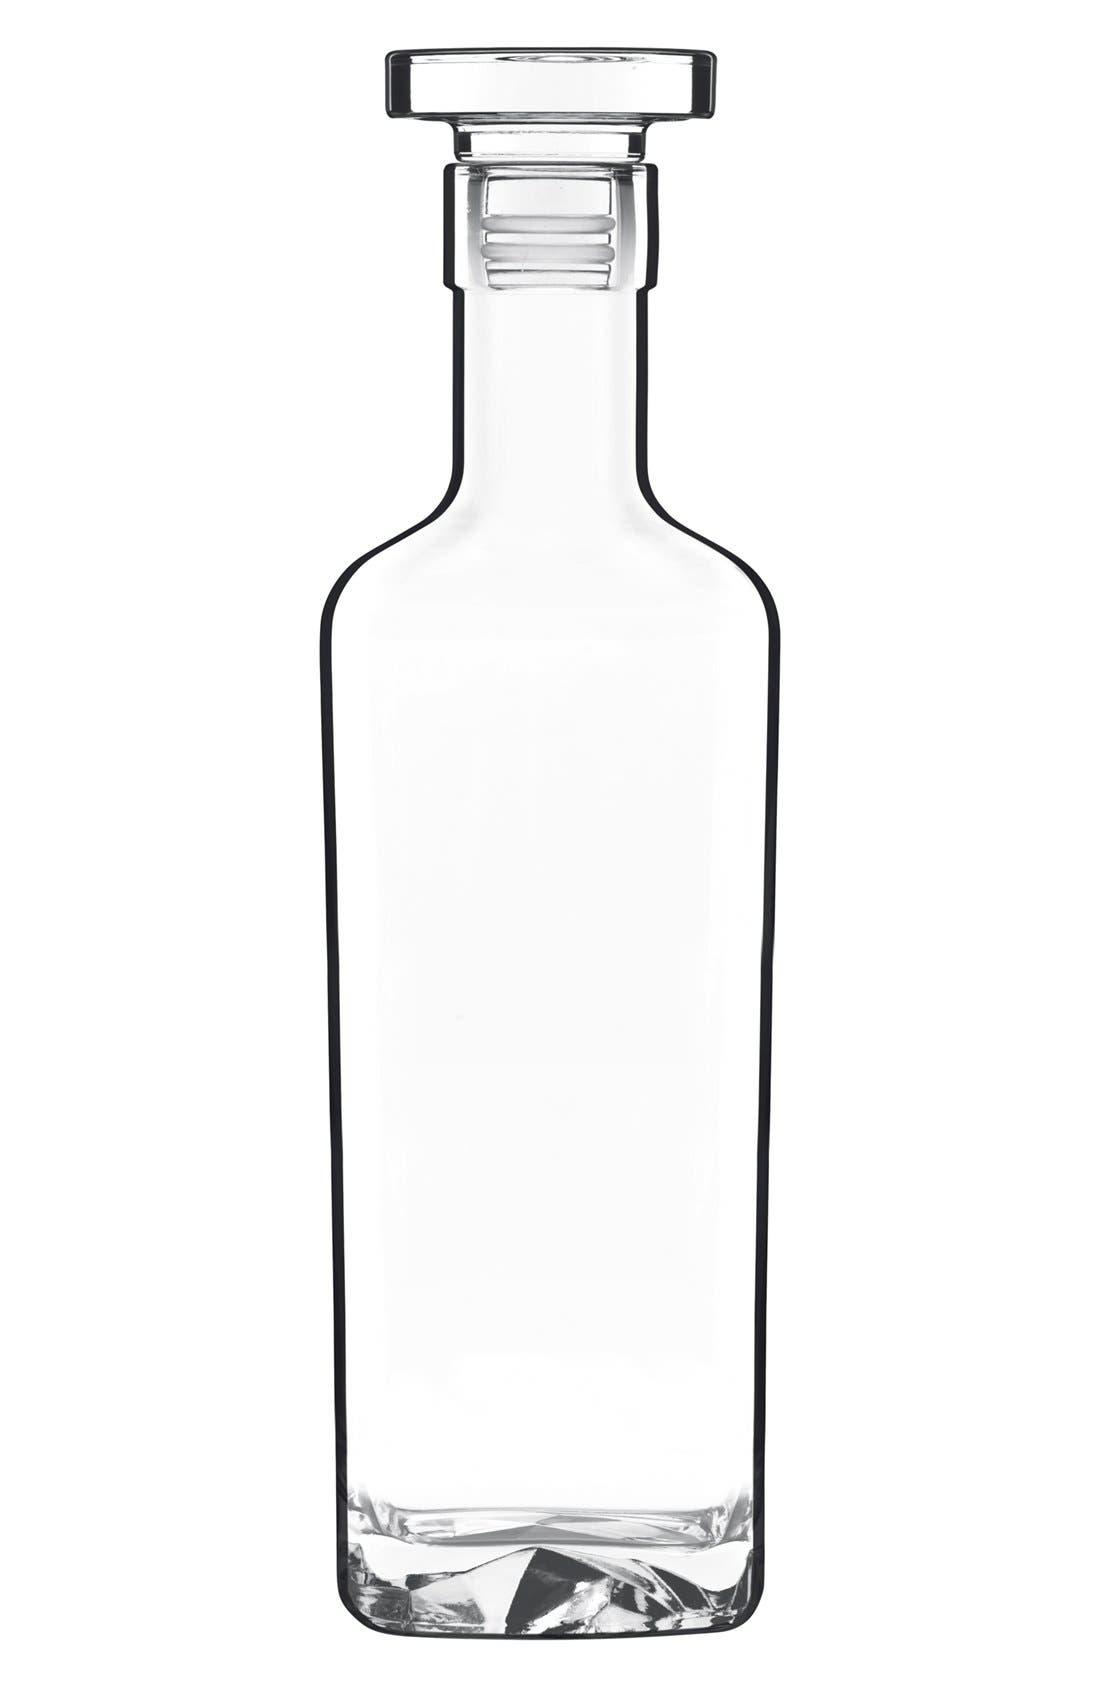 Luigi Bormioli 'On the Rocks' Spirits Bottle